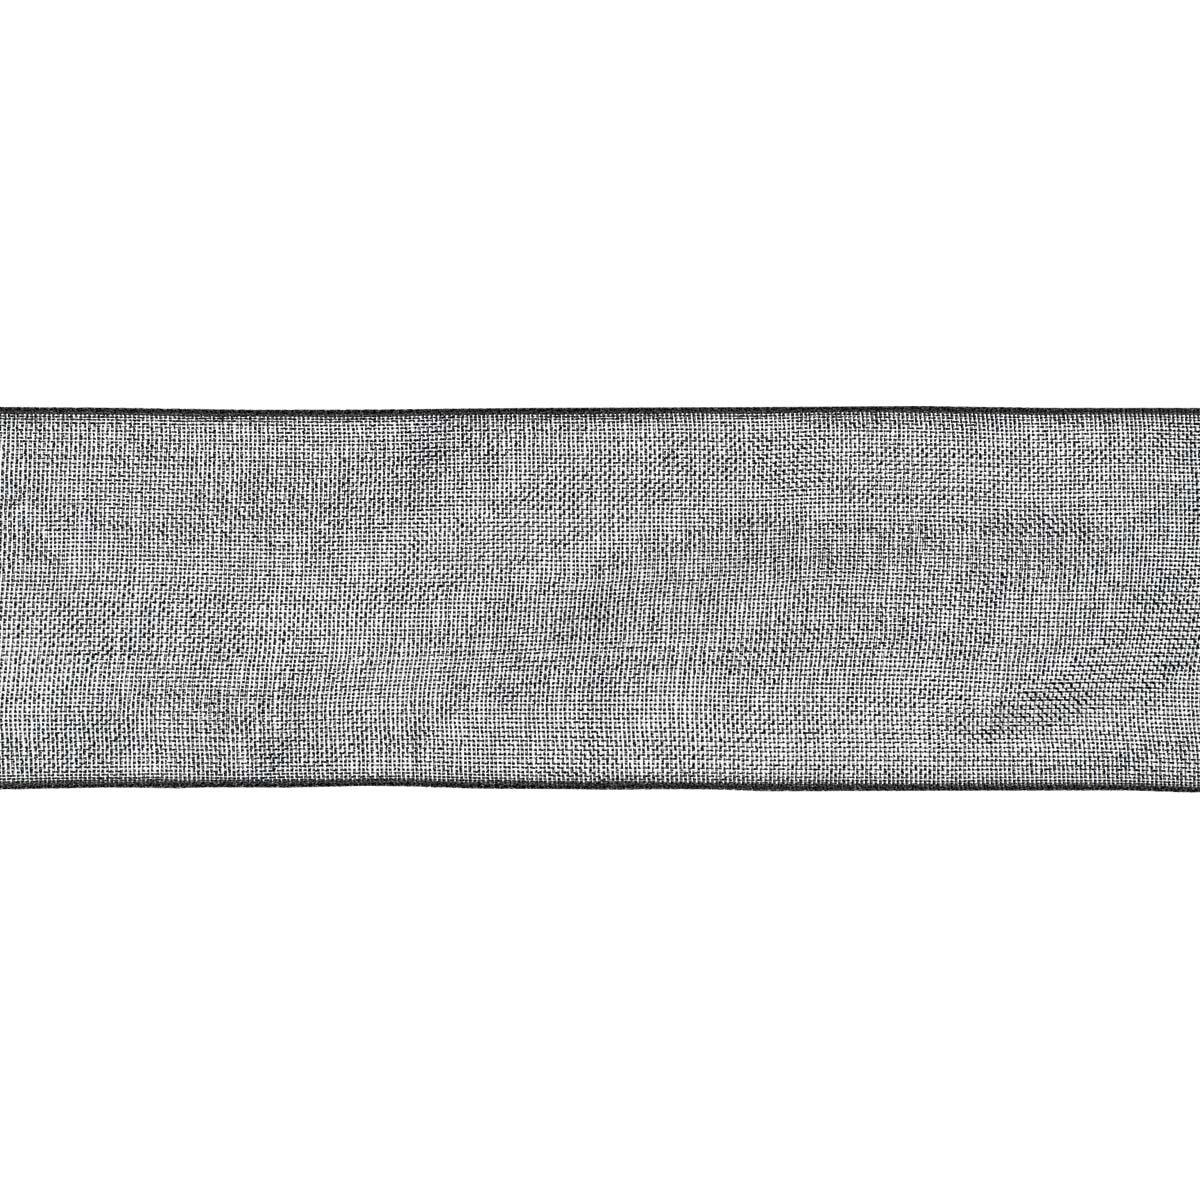 2103-25-12 PERRAMON&BADIA Лента органза 25 мм